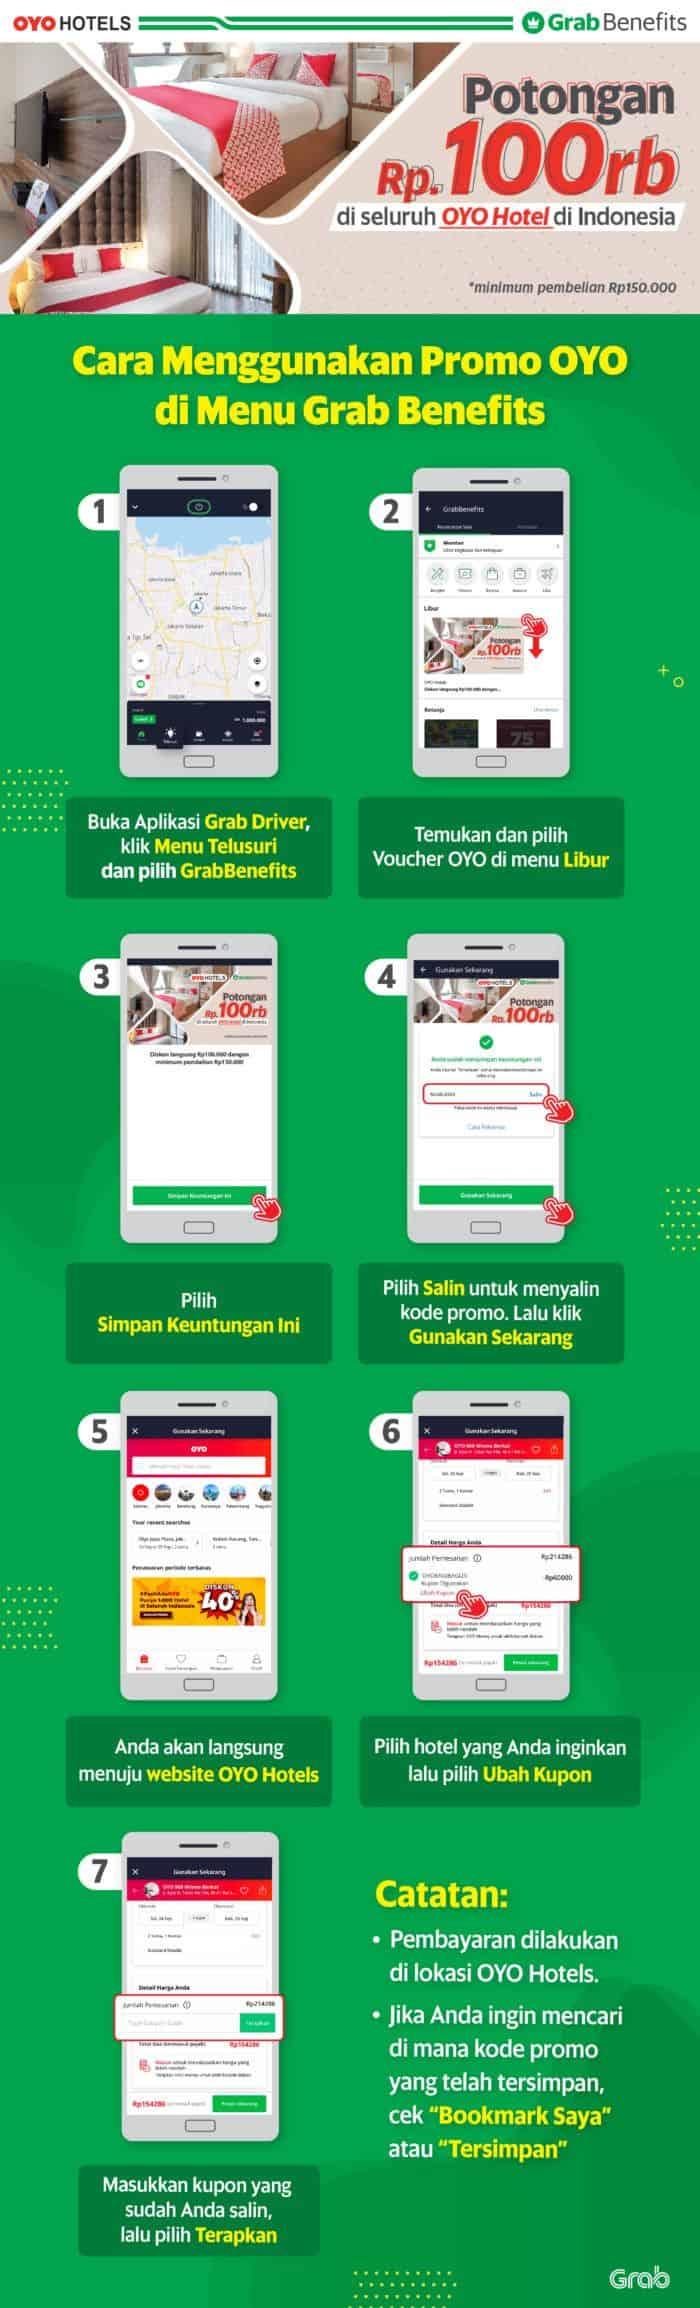 Grabcar Indonesia Diskon Spesial Di Oyo Hotel Seluruh Indonesia Grab Id